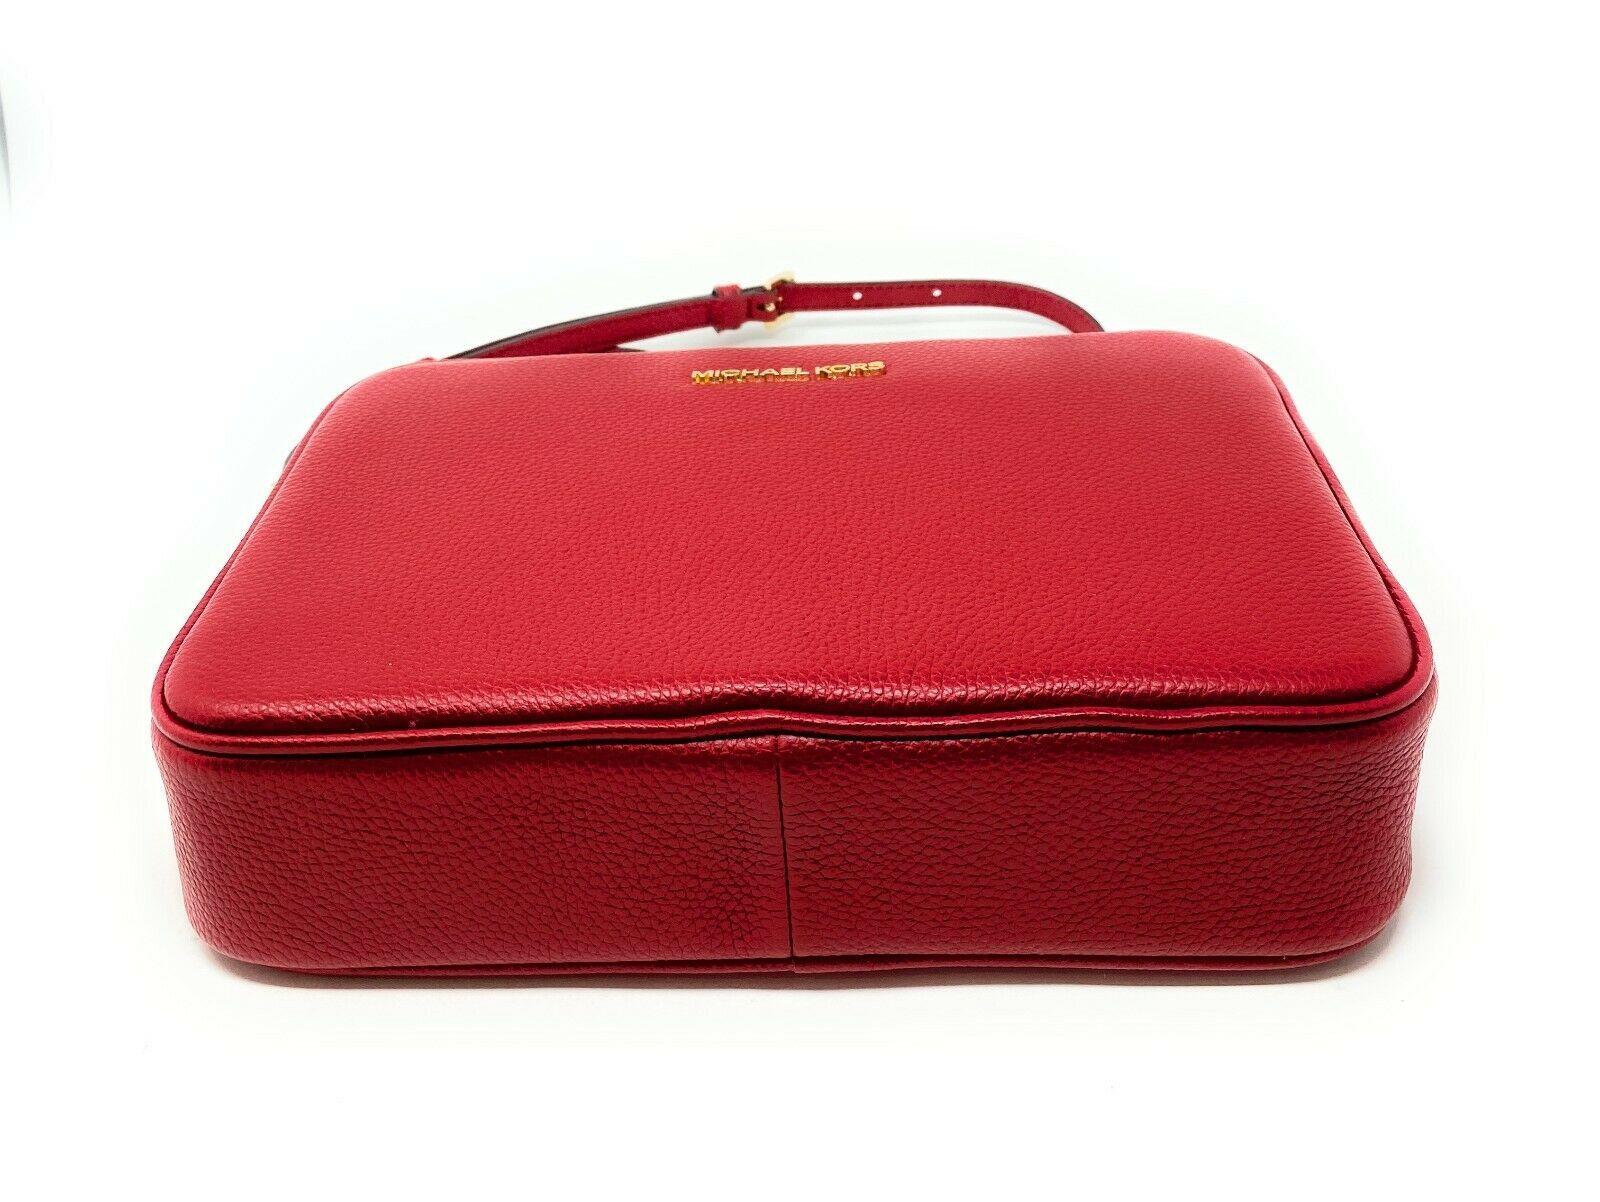 thumbnail 30 - Michael Kors Jet Set Item Large East West Crossbody Chain Handbag Clutch $298